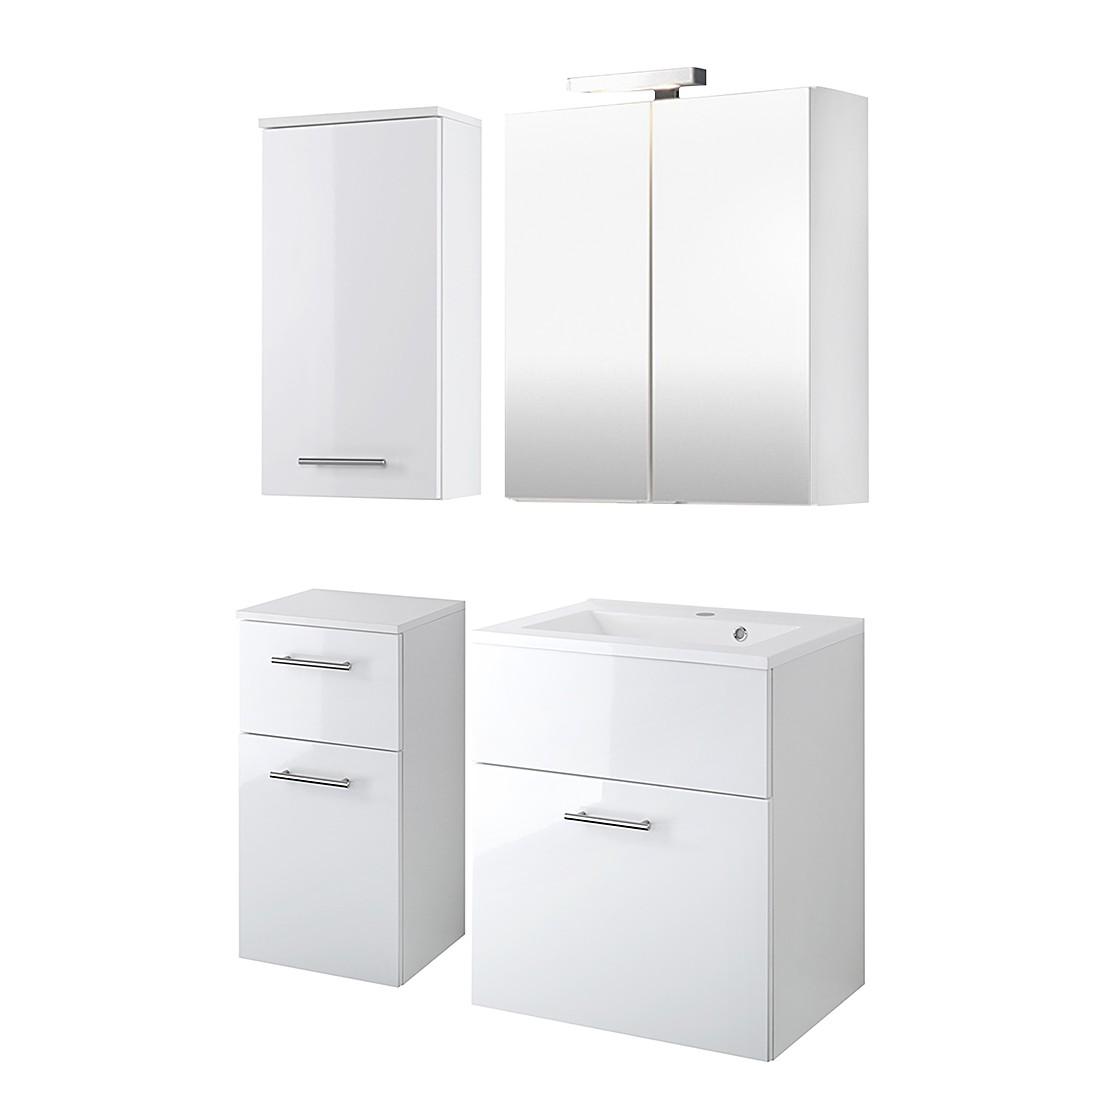 Home 24 - Ensemble de meubles, 4 éléments aqua spa - blanc, giessbach